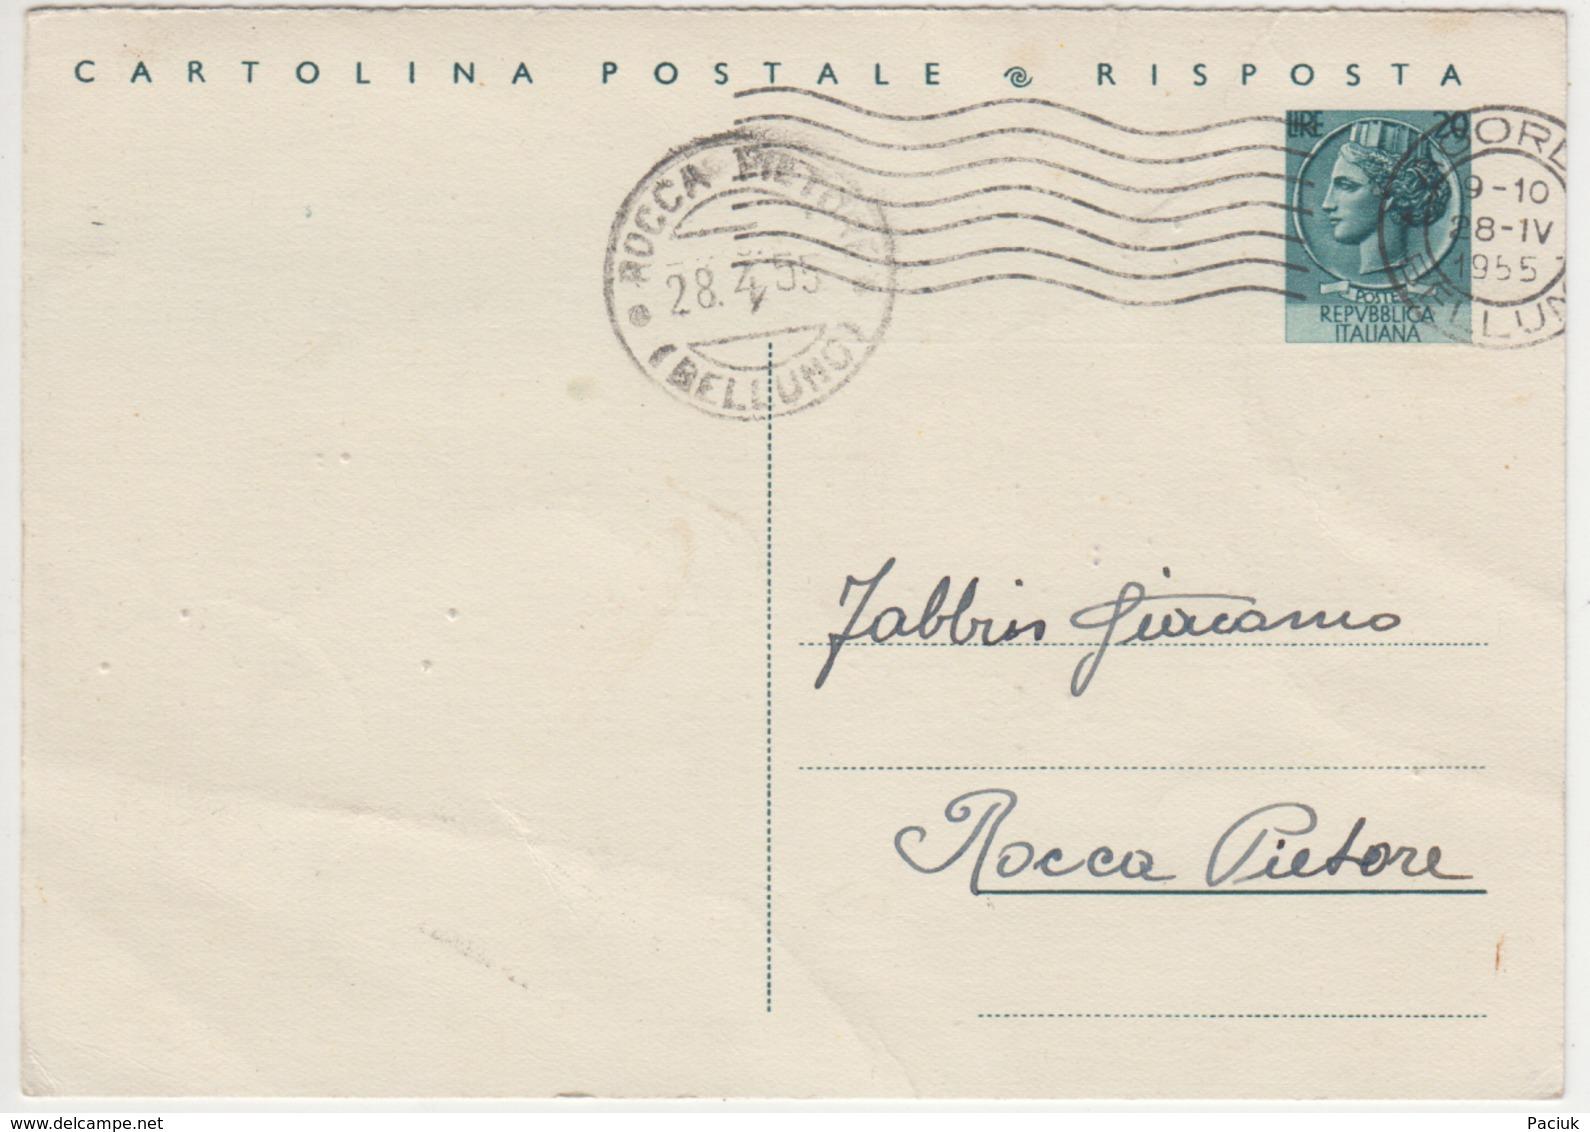 Cartolina Postale Risposta - Postal Services